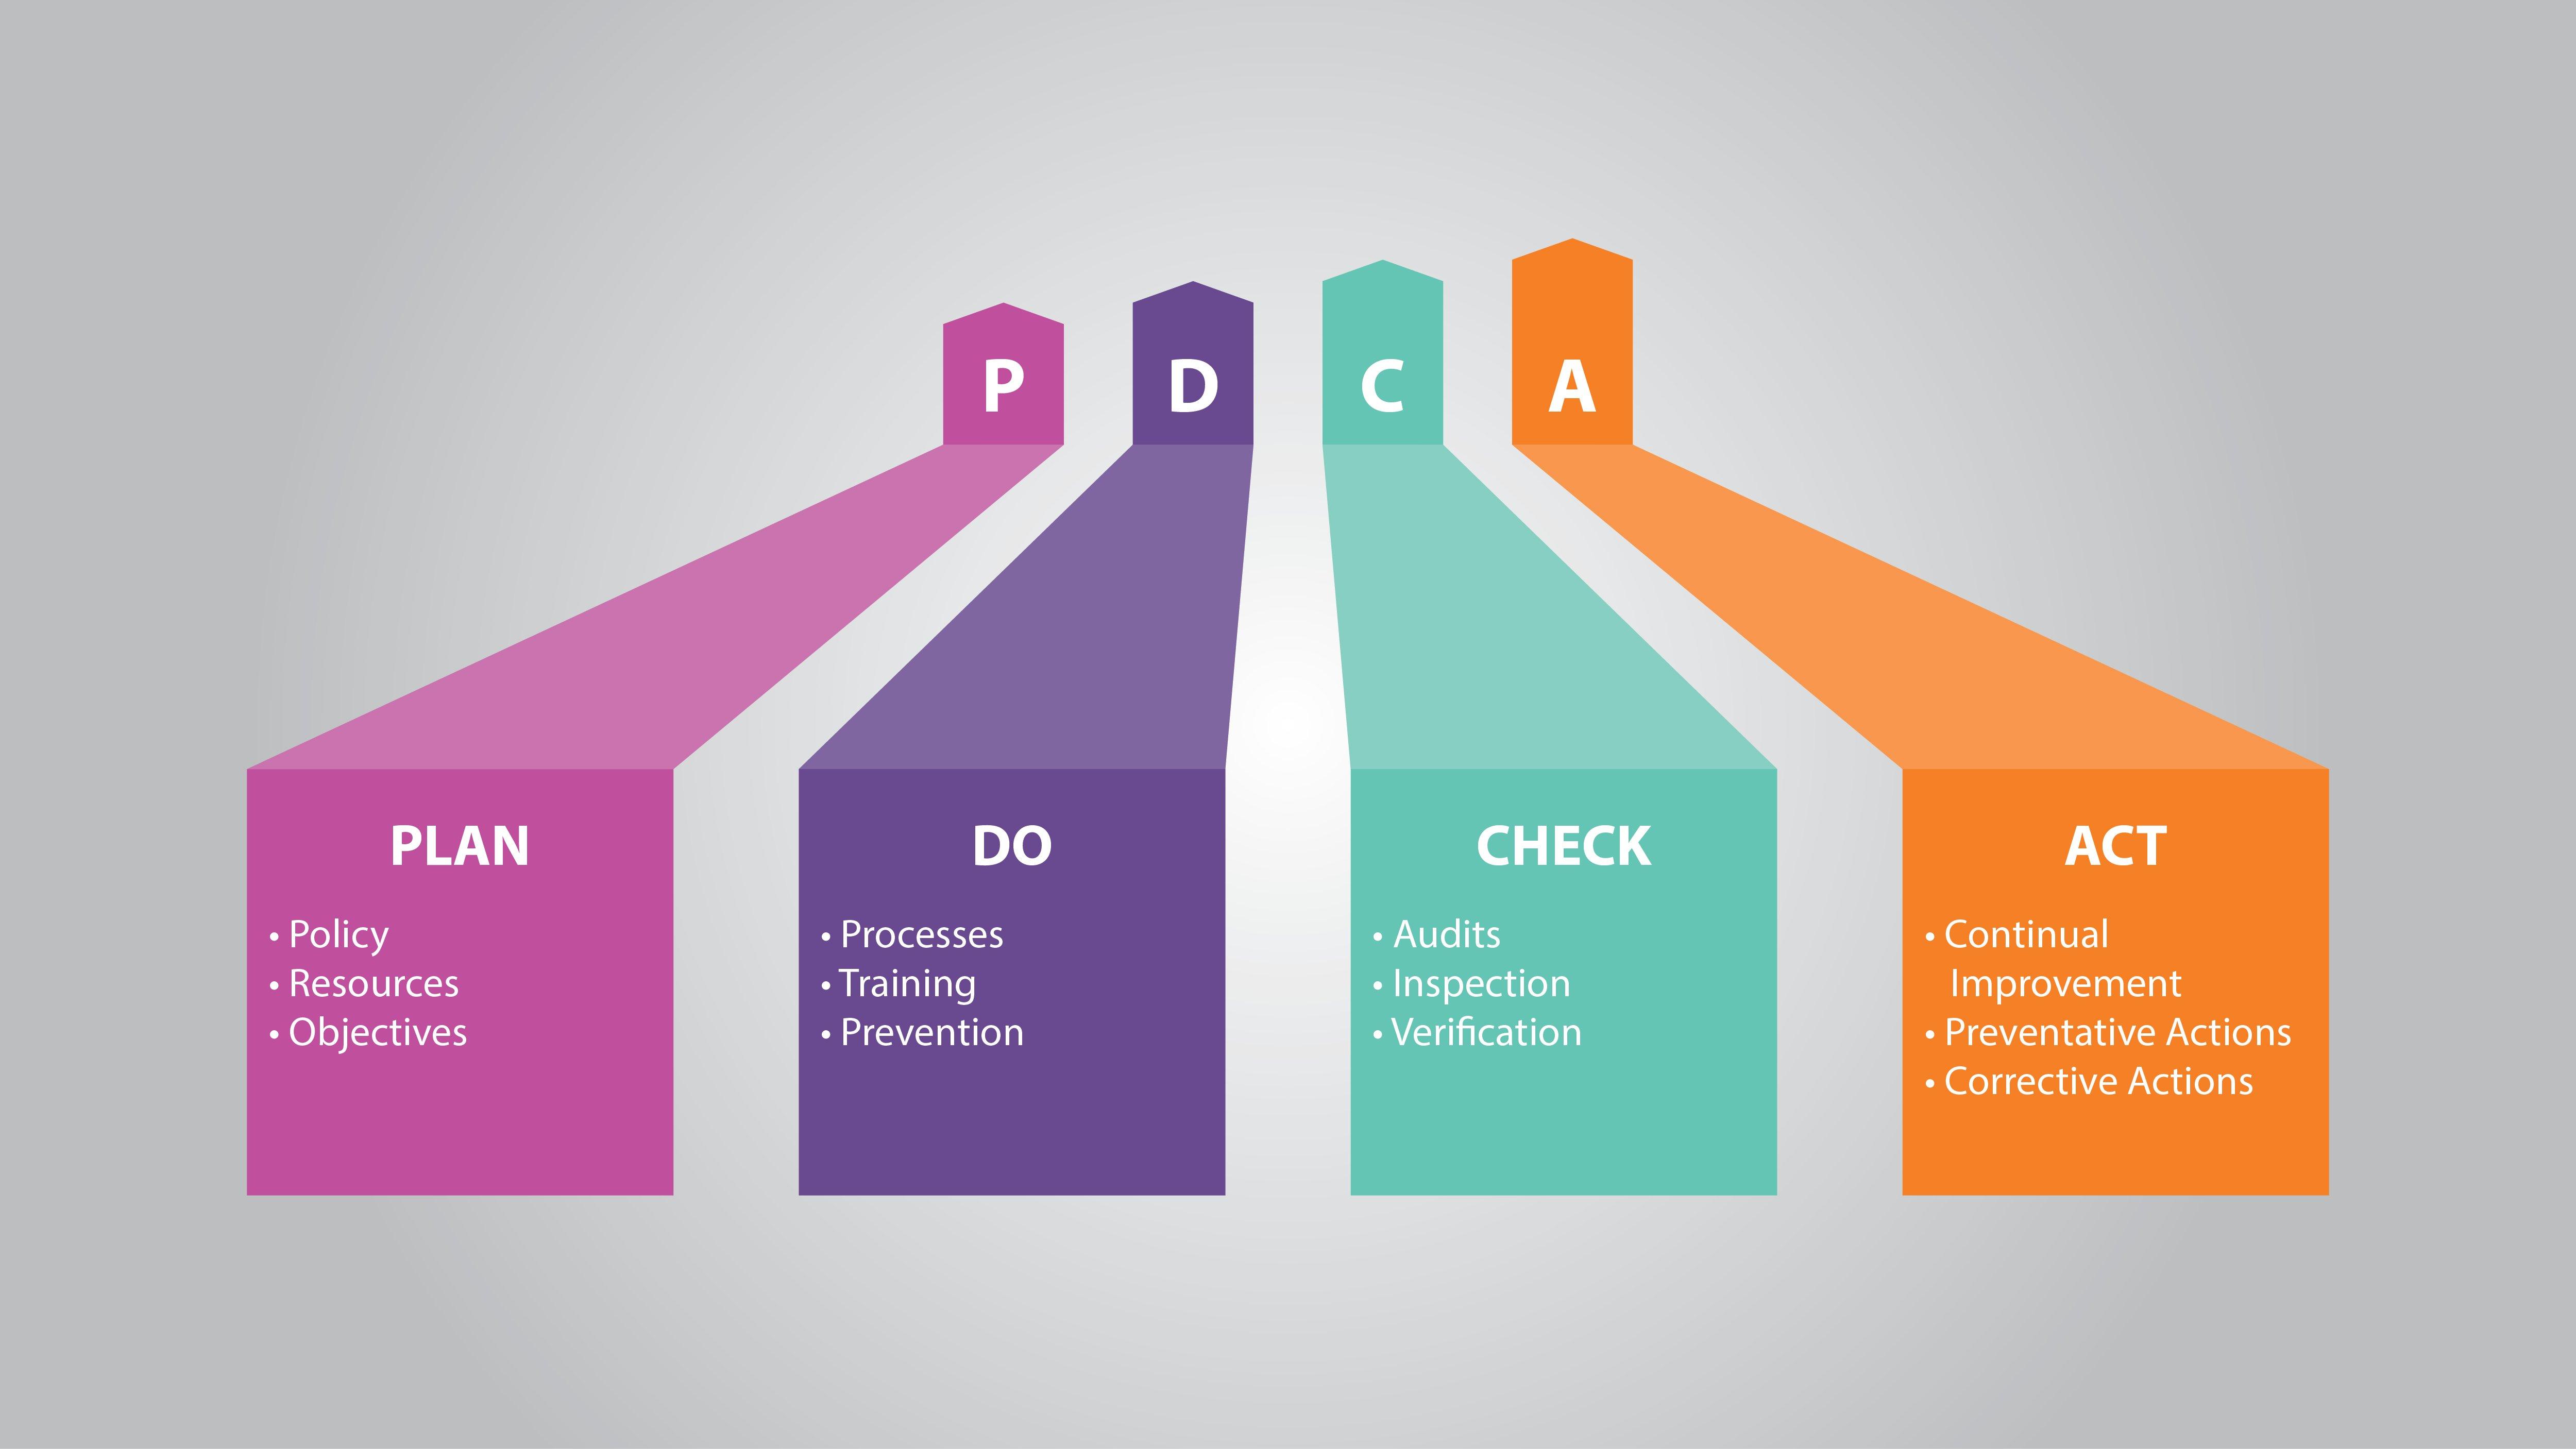 PDCA Process - Plan-Do-Check-Act